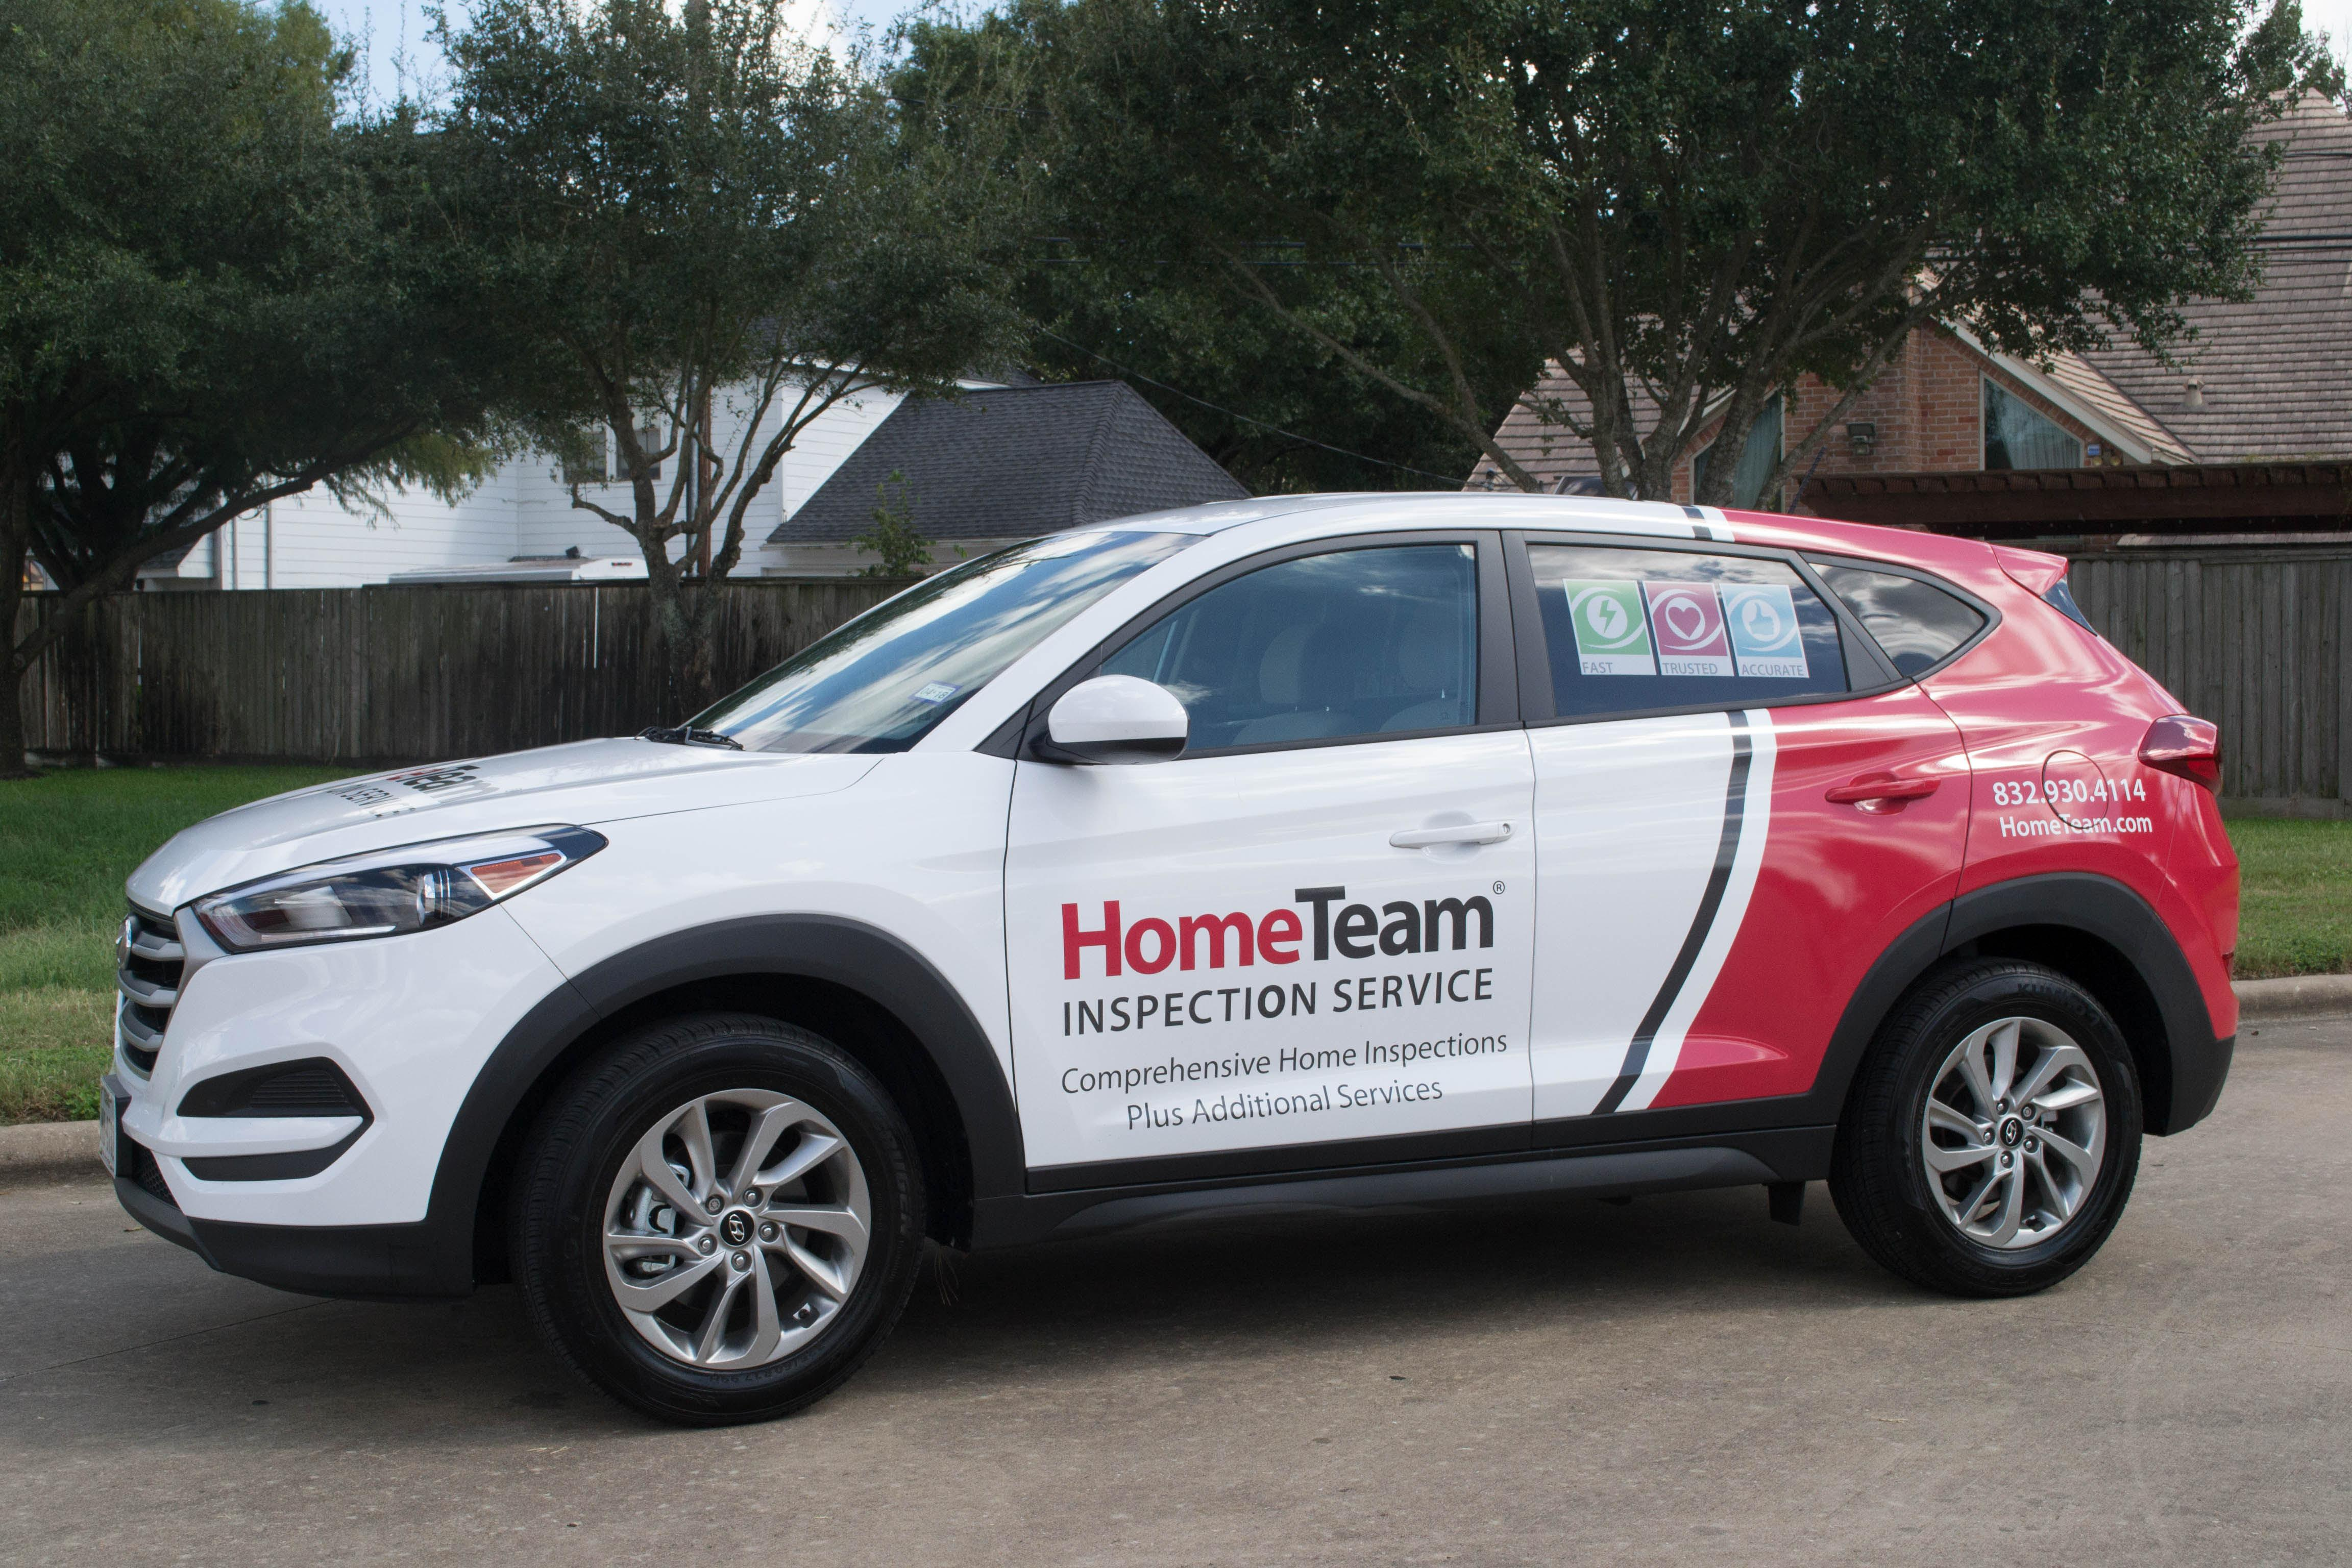 HomeTeam Inspection Service image 1